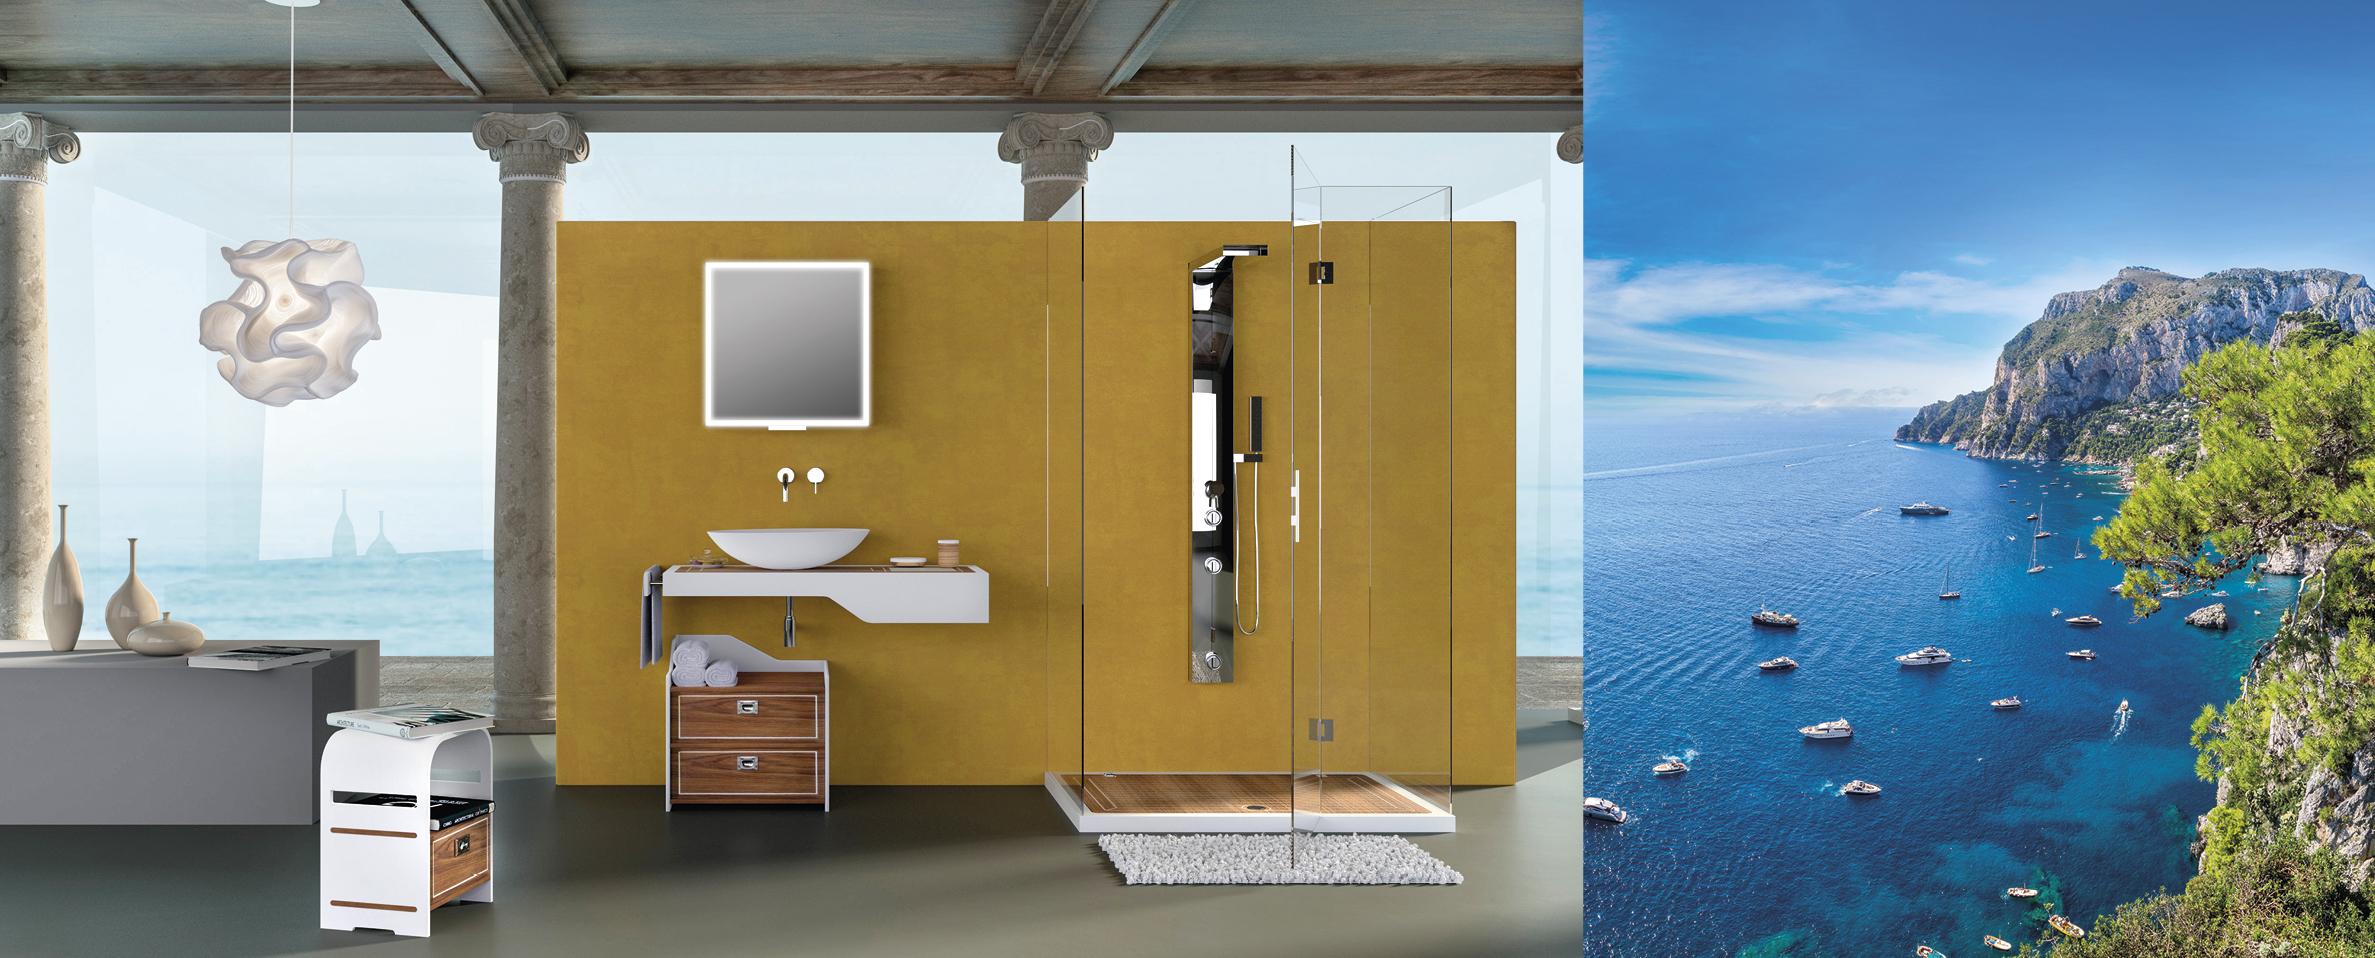 Aqua Mood Mobili Bagno.Aquateak Cipi Design Ed Accessori Per La Stanza Da Bagno